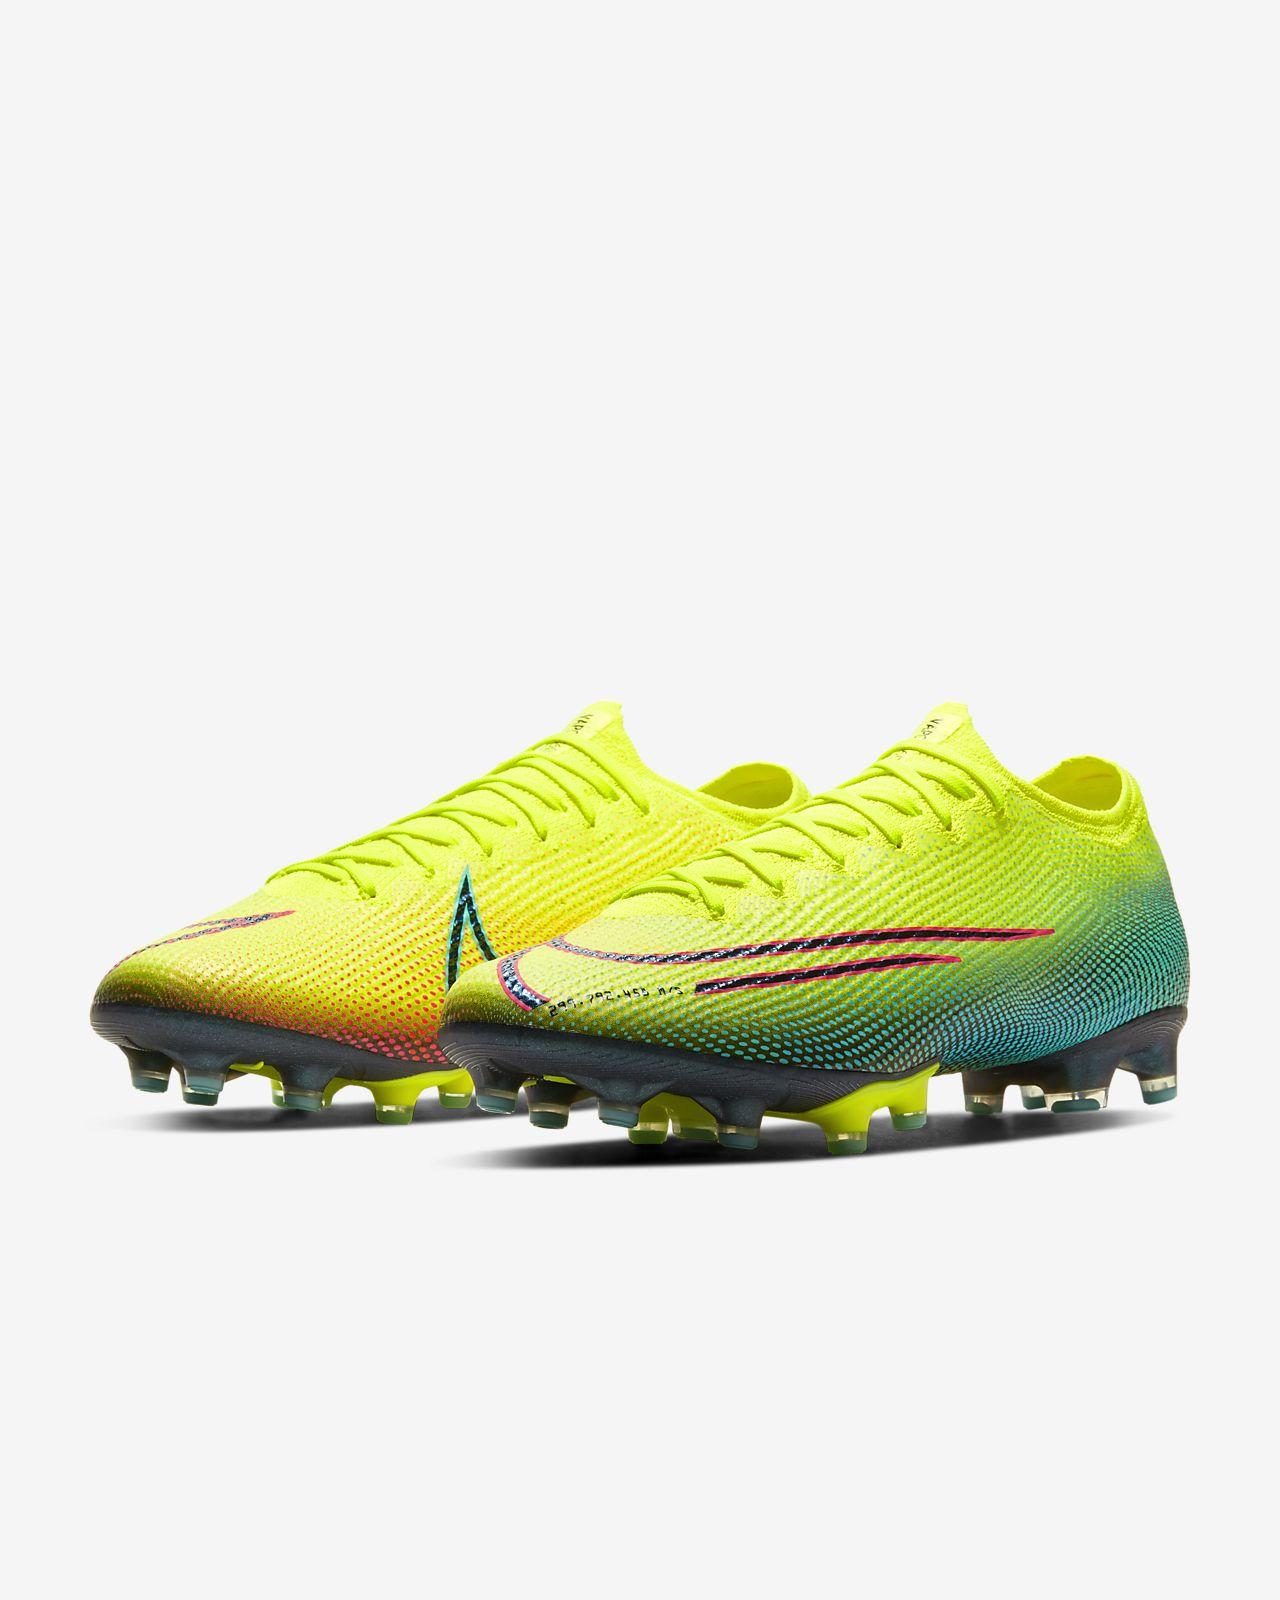 Scarpa da calcio per erba artificiale Nike Mercurial Vapor